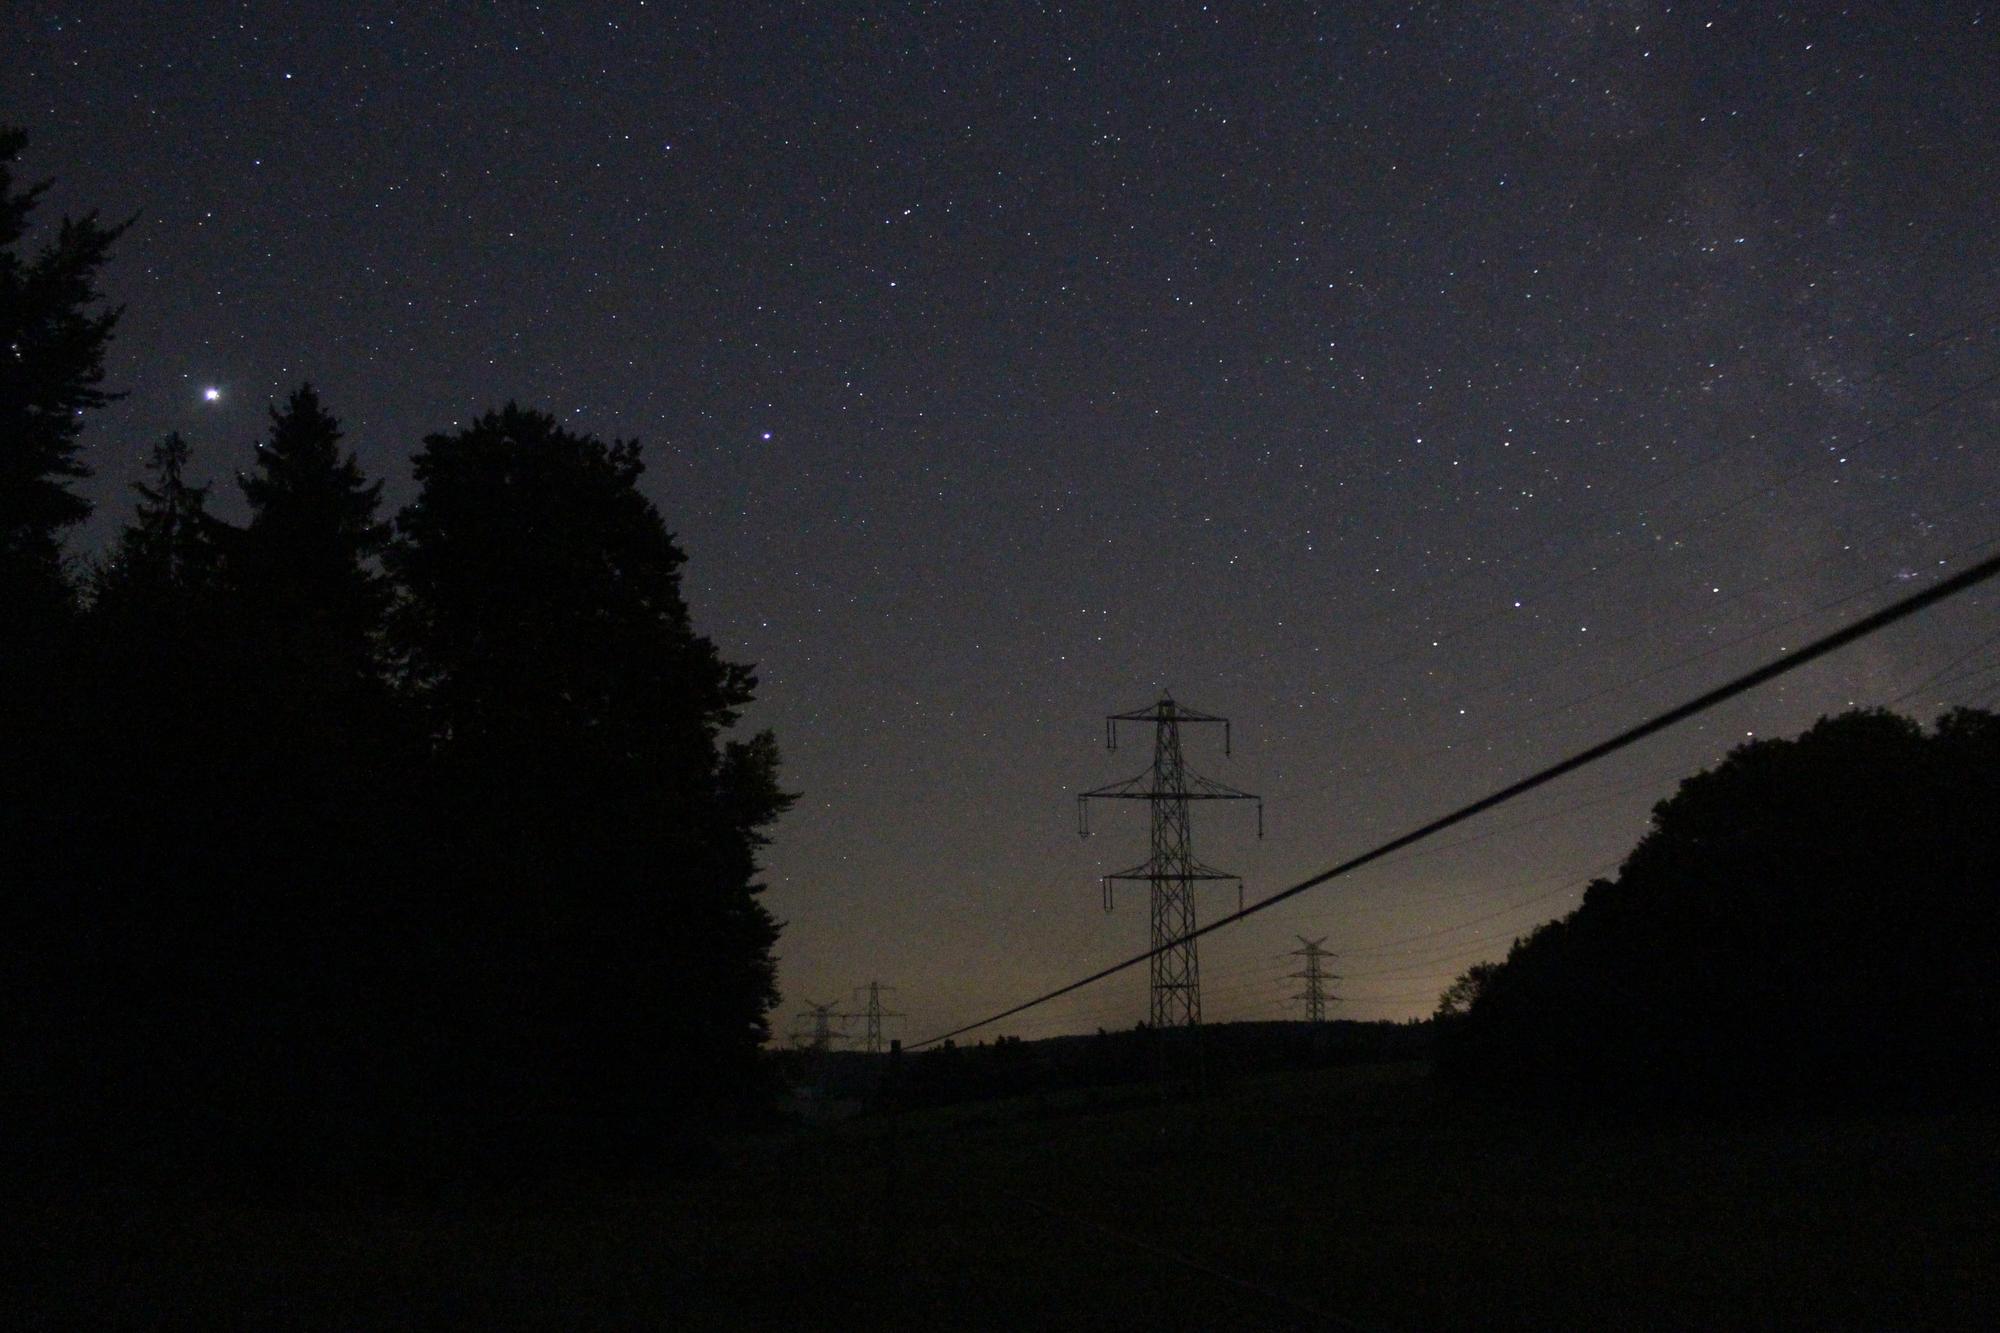 The world at night - Denkmal der Nord-Süd-Leitung